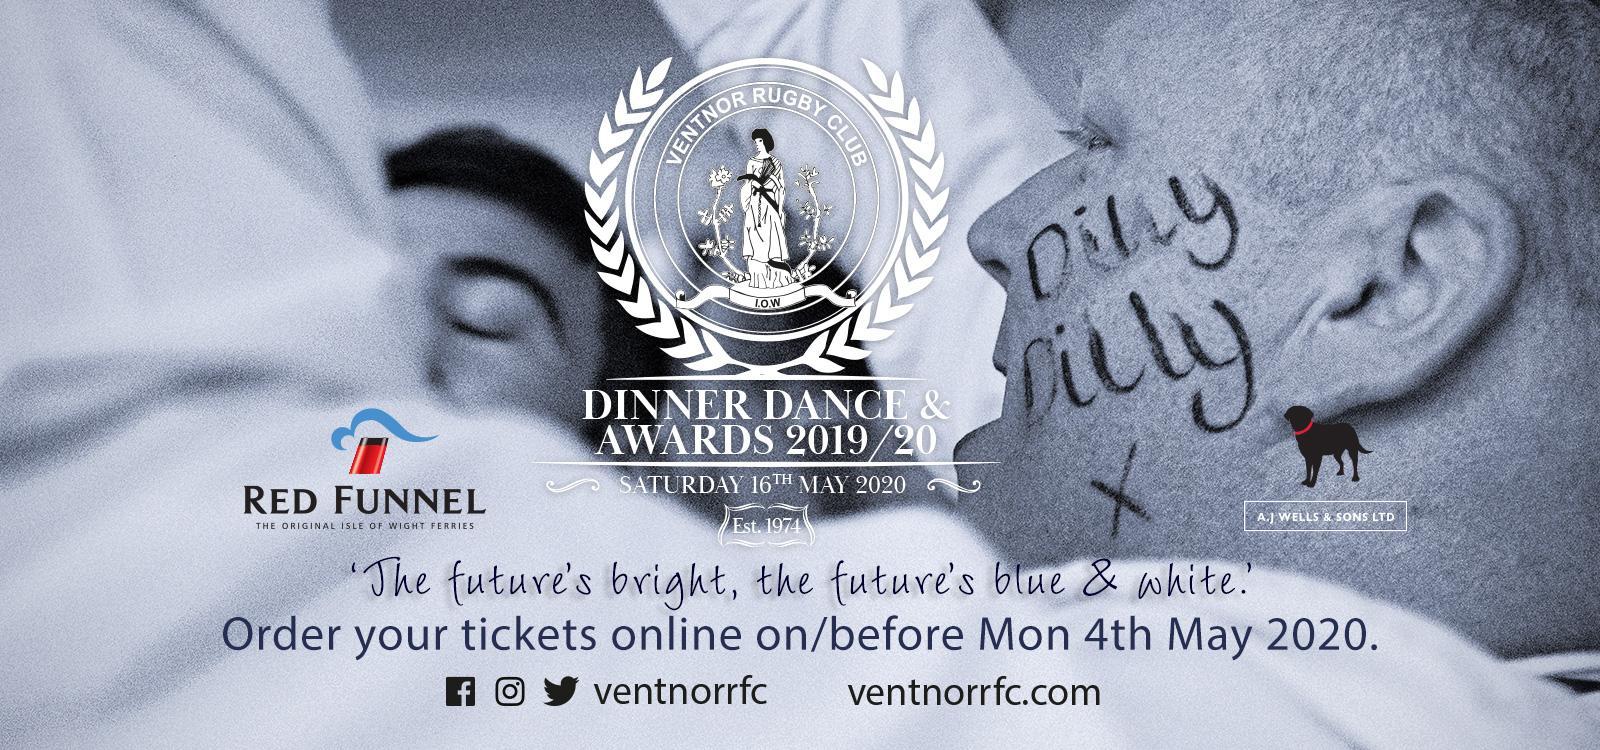 ventnor-rfc-dinner-dance-2019-20